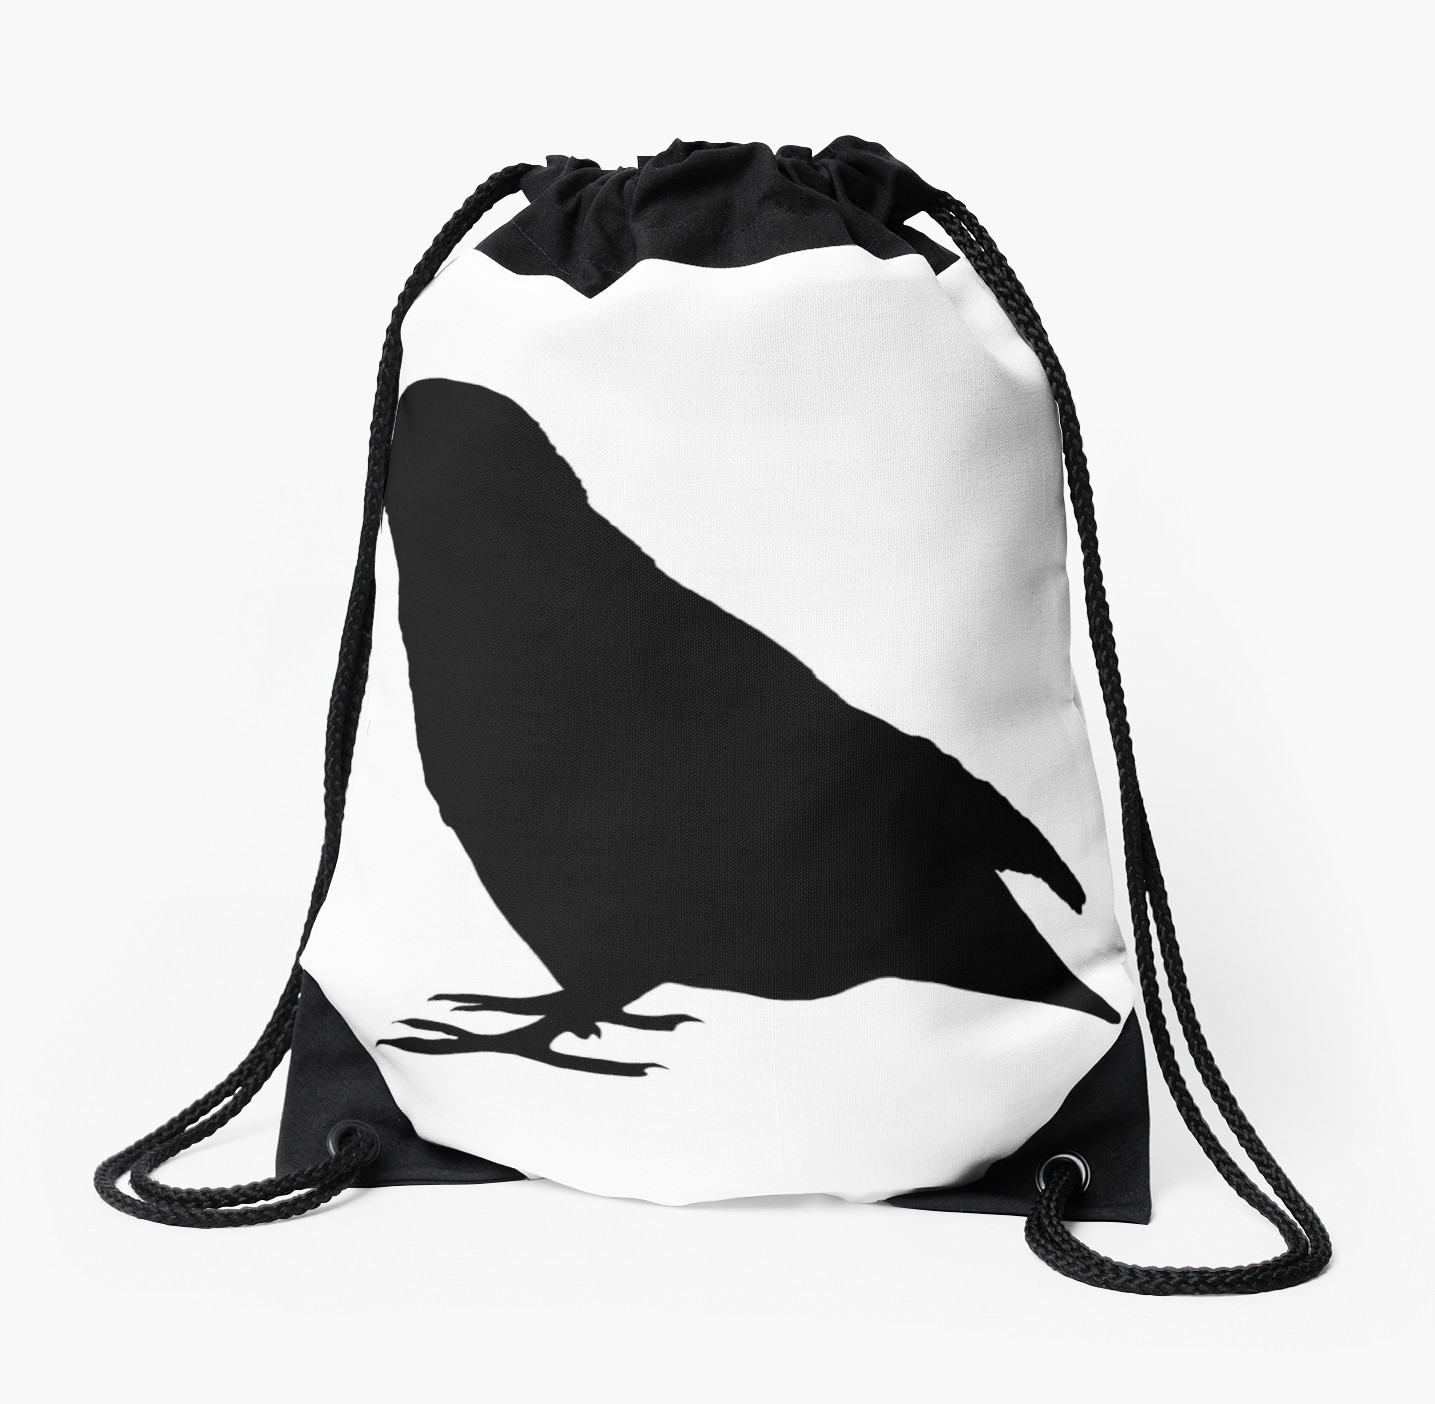 1435x1404 Lovebird Silhouette Drawstring Bags By Michelleachan Redbubble